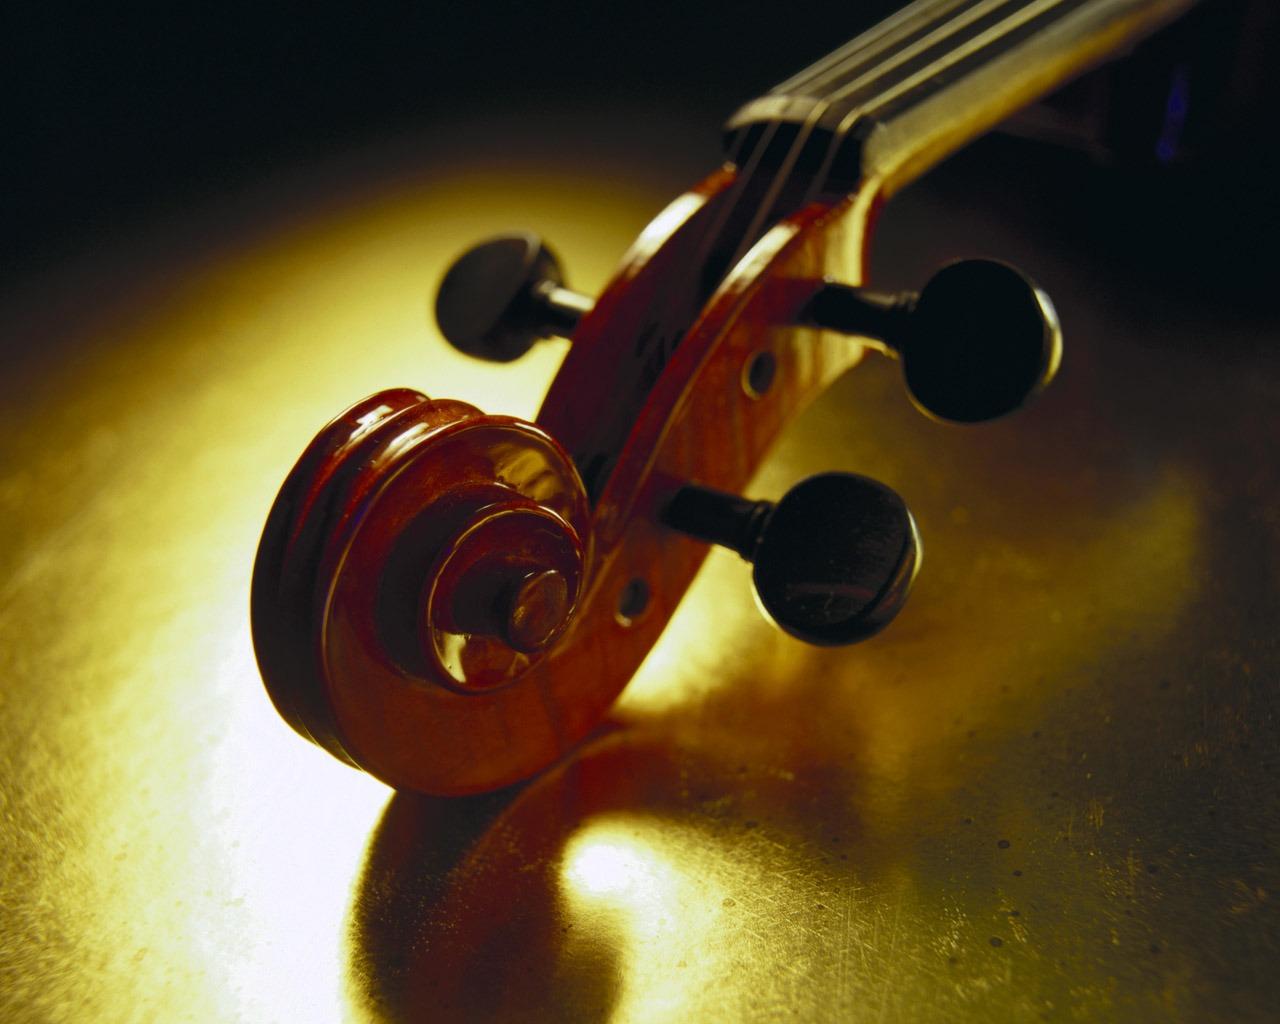 Photo Essays On Music